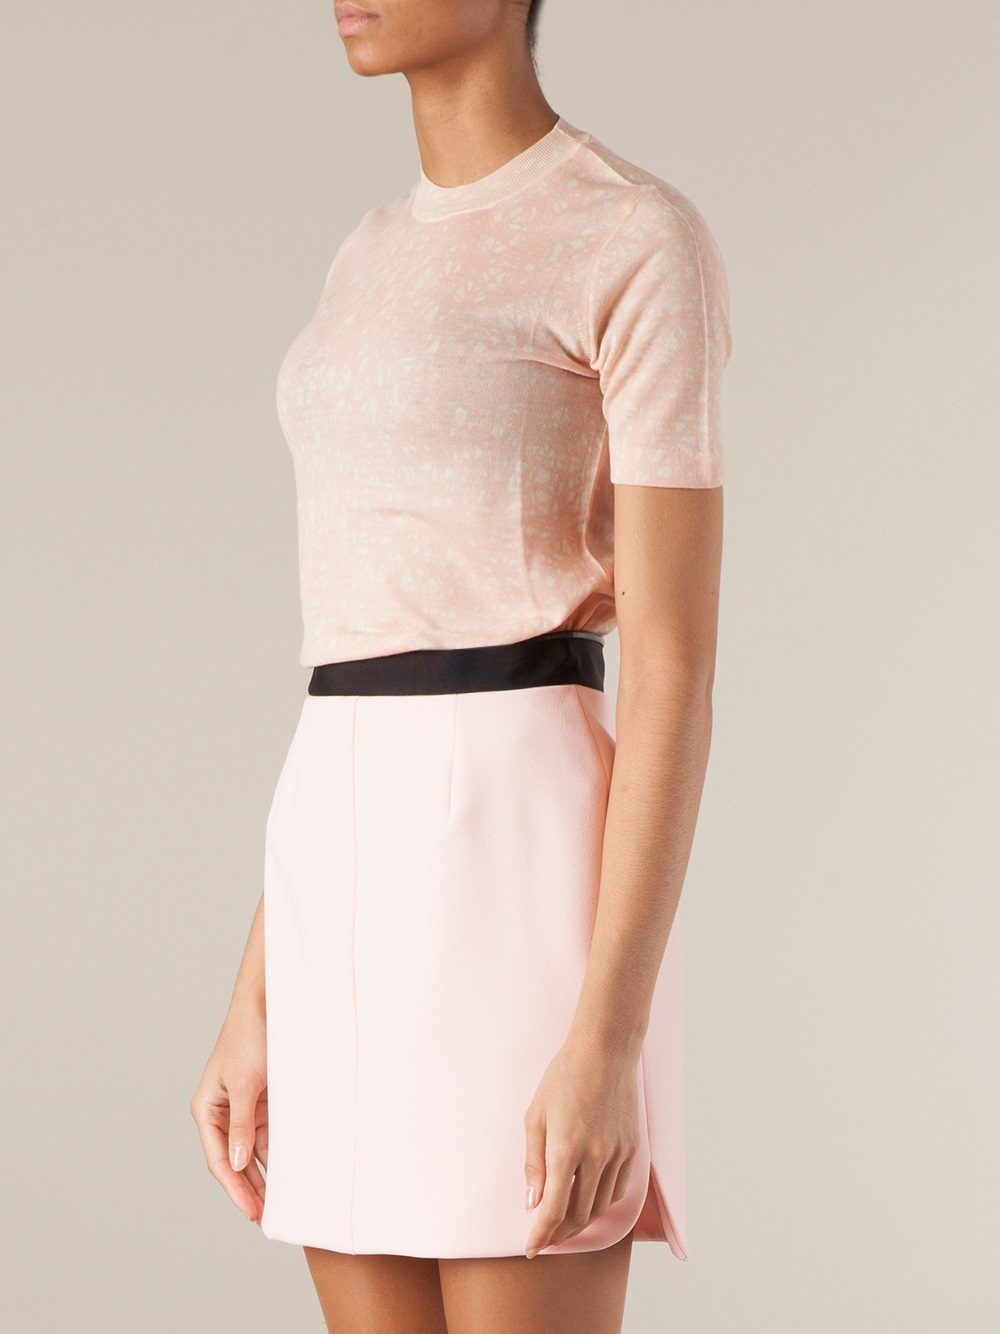 Balenciaga Short Sleeve Sweater in Pink | Lyst